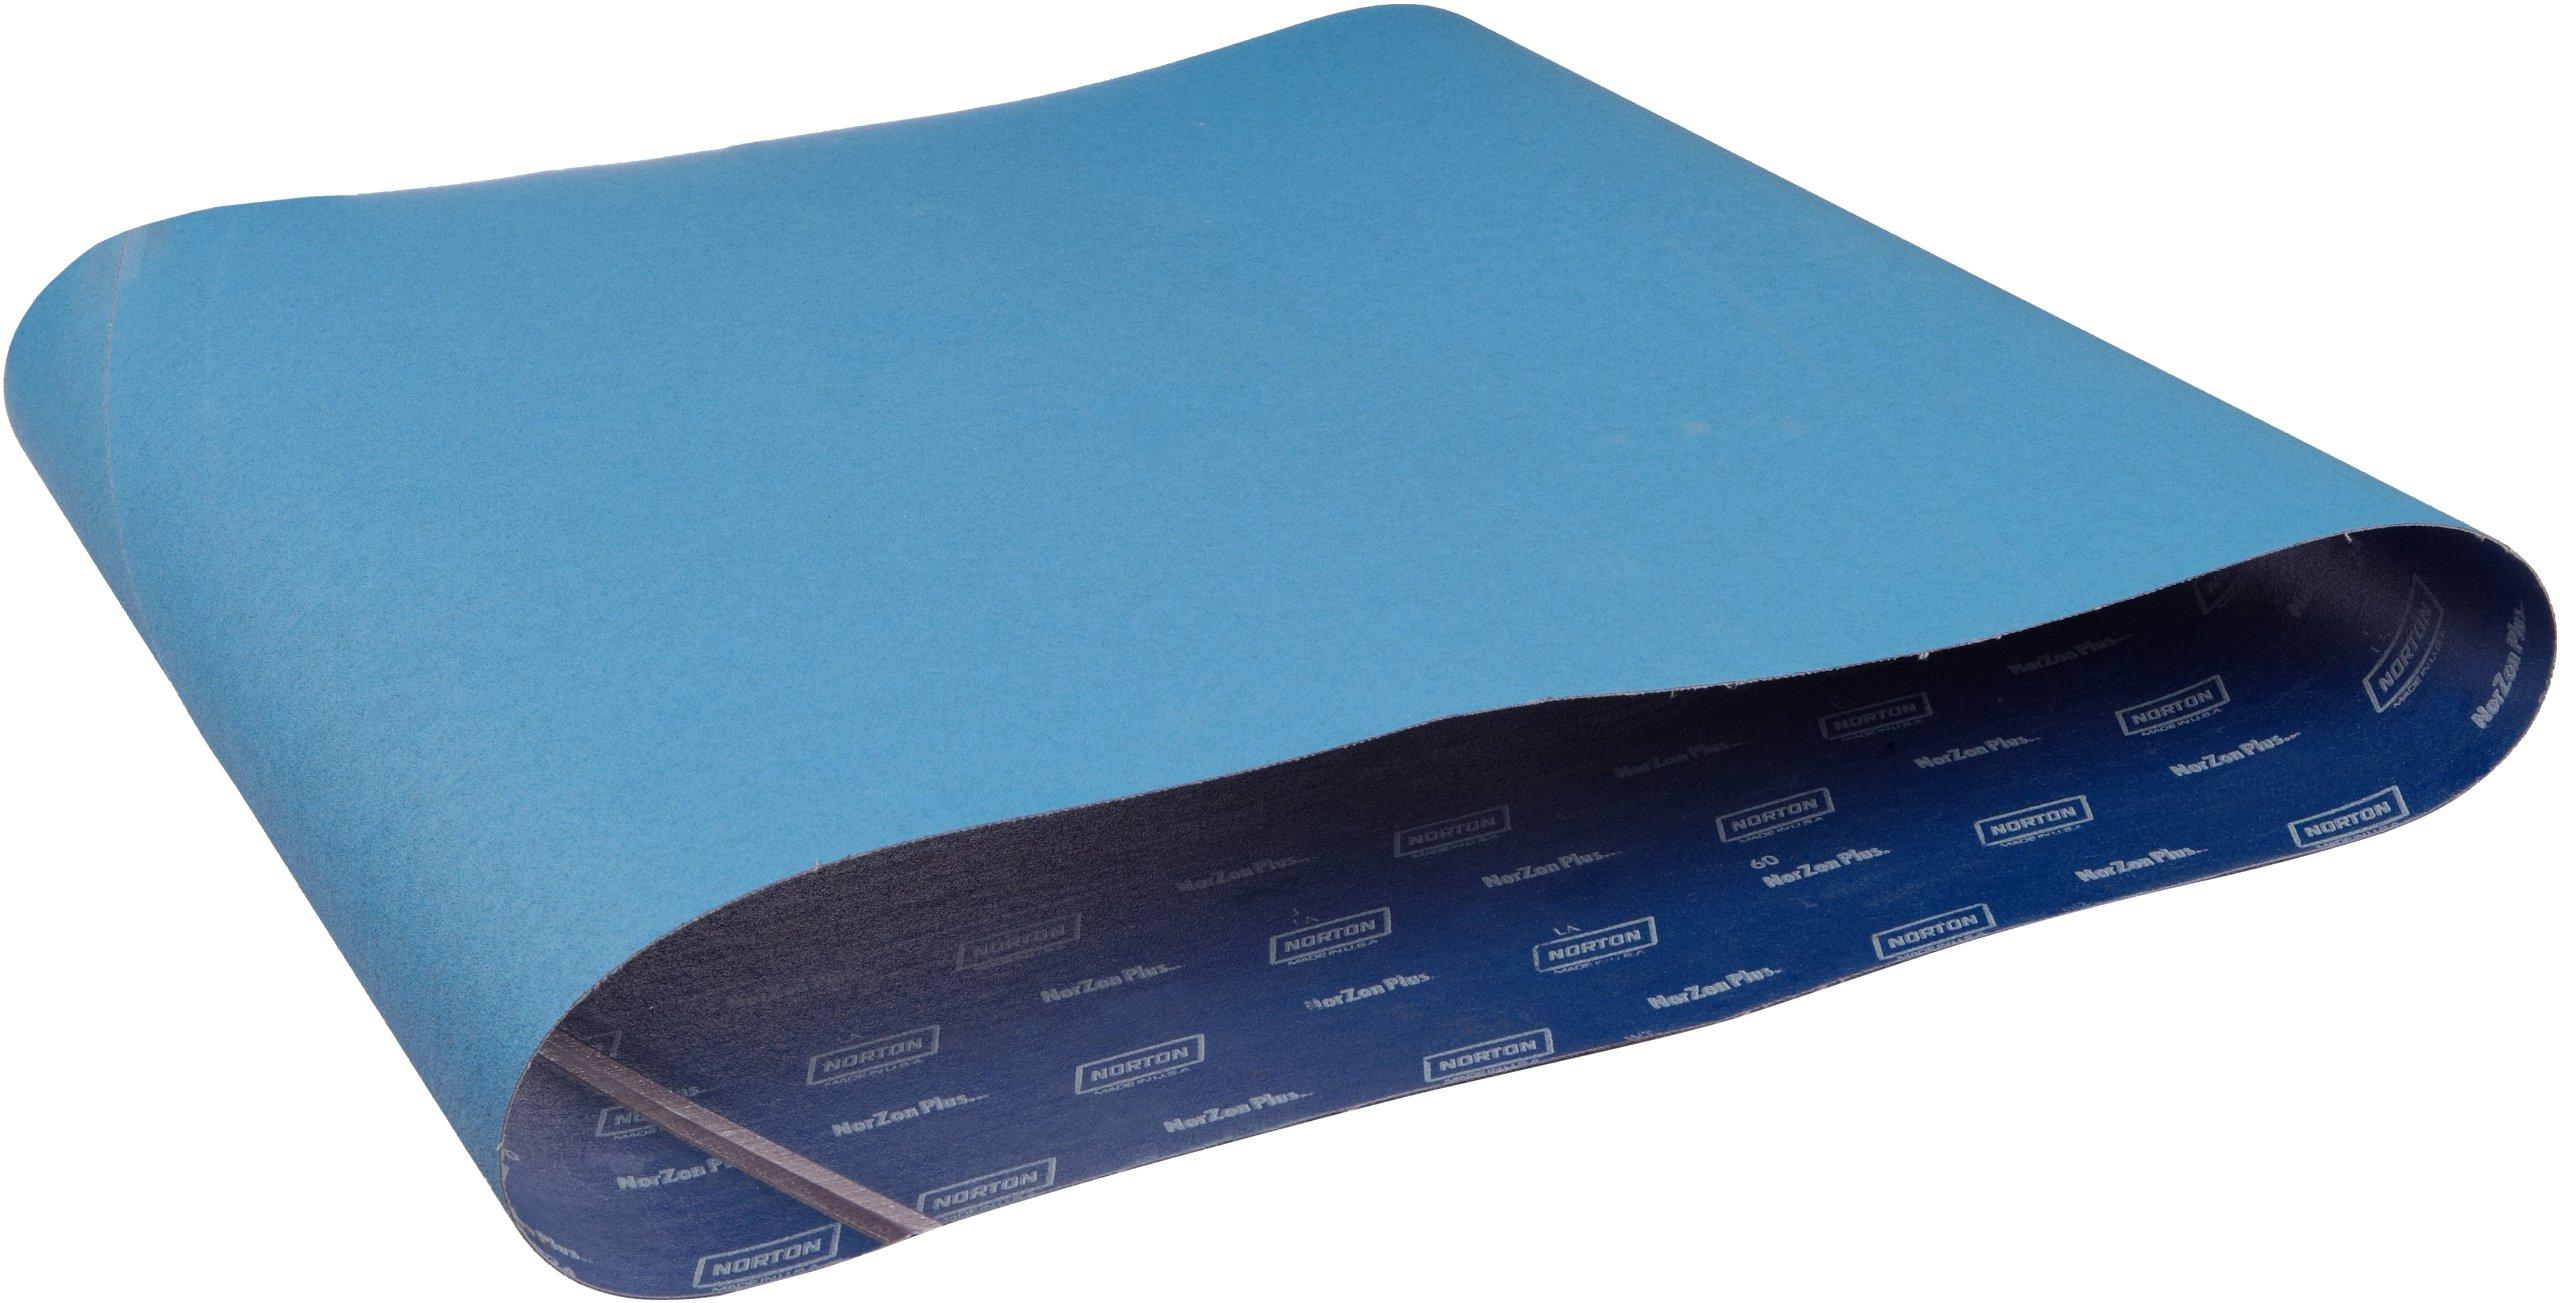 Norton NorZon Plus R824 Cloth Abrasive Belt, Waterproof, Cloth Backing, Zirconia Alumina, 37'' Width, 75'' Length, Grit 36 (Pack of 2)